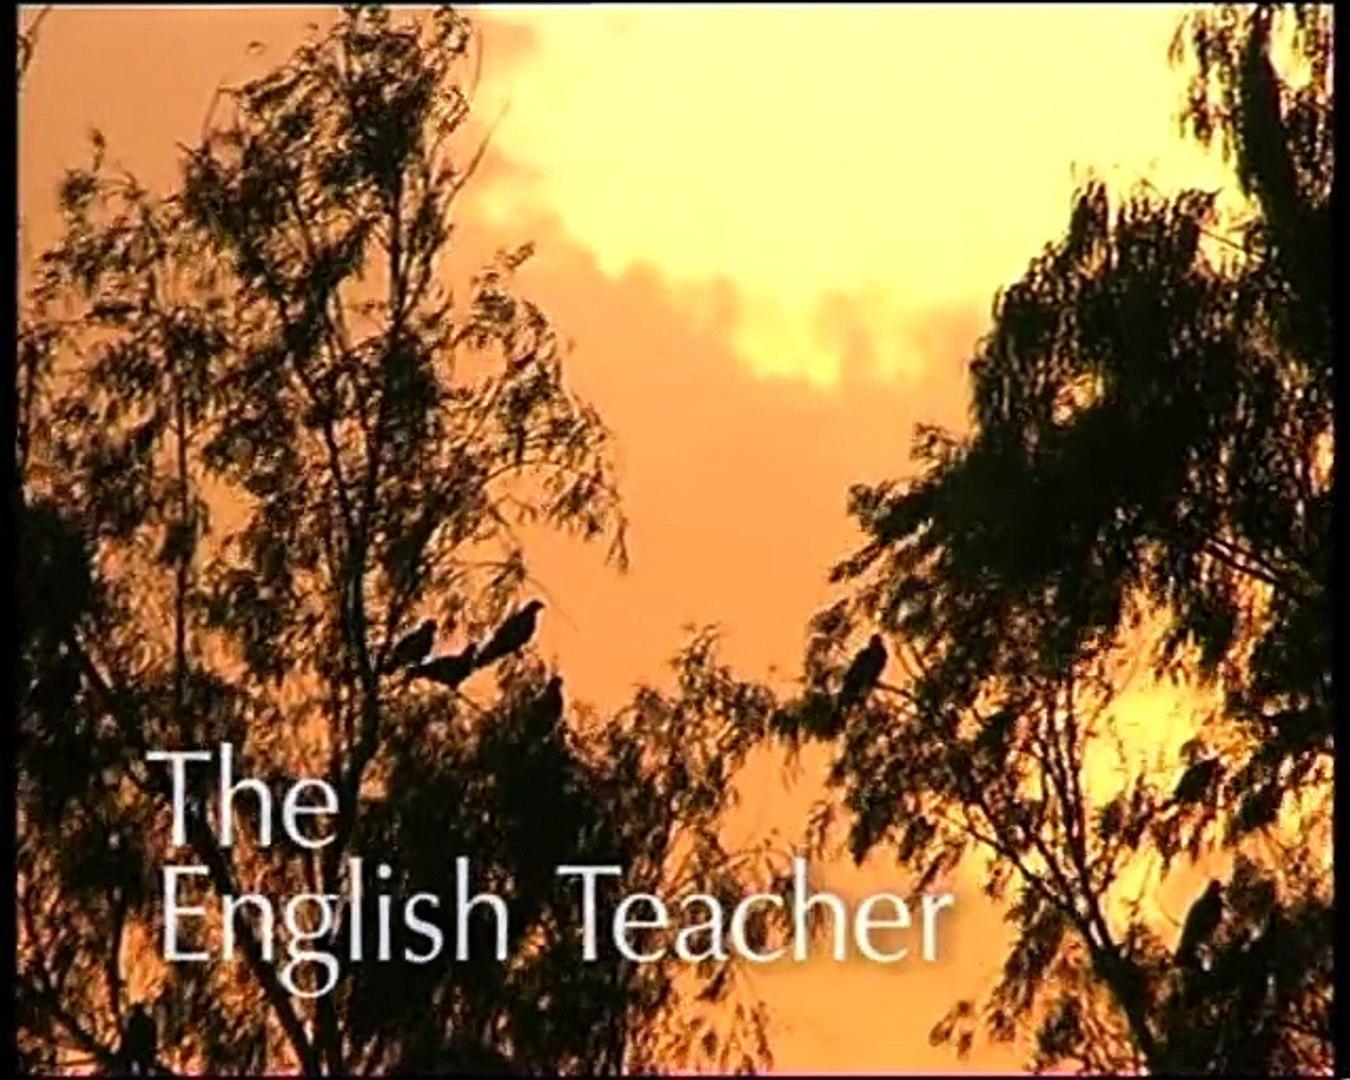 THE ENGLISH TEACHER - Documentary, Channel 4, UK (Clip)